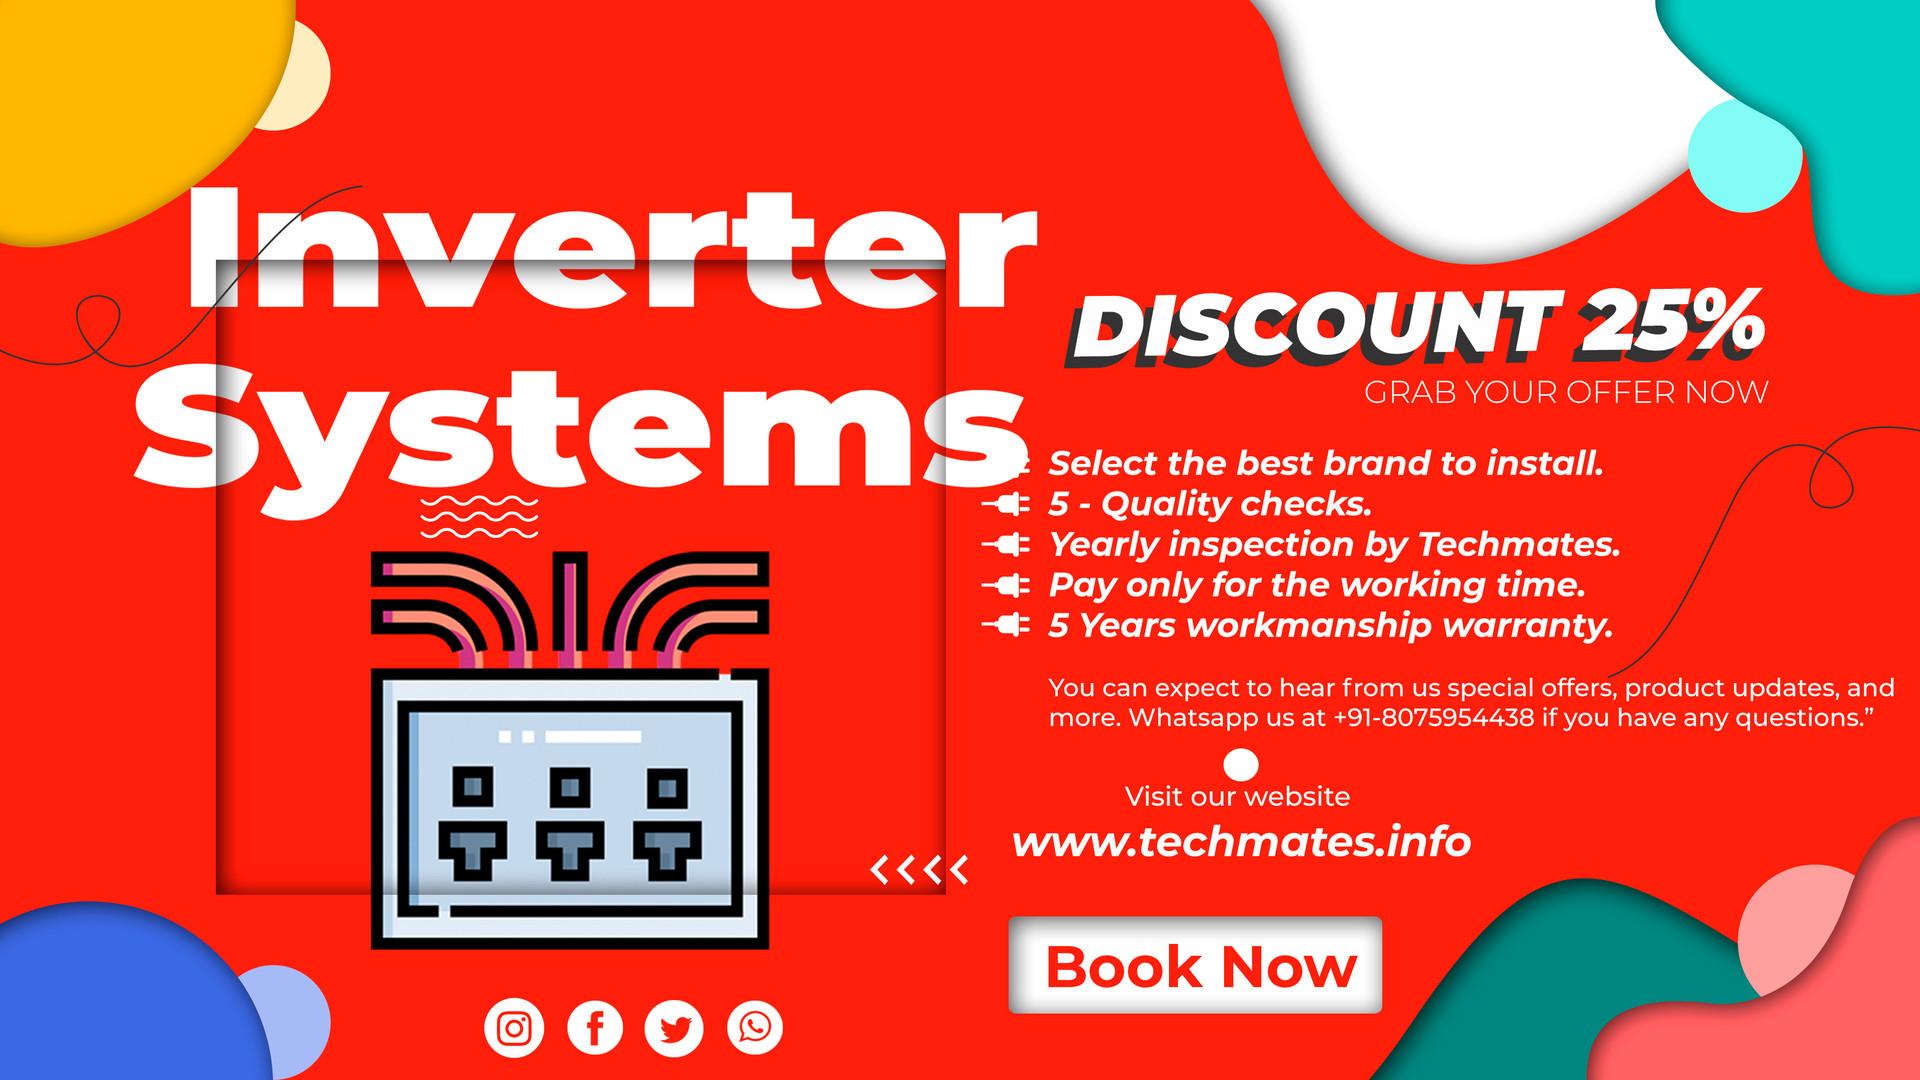 Inverter Systems Offer